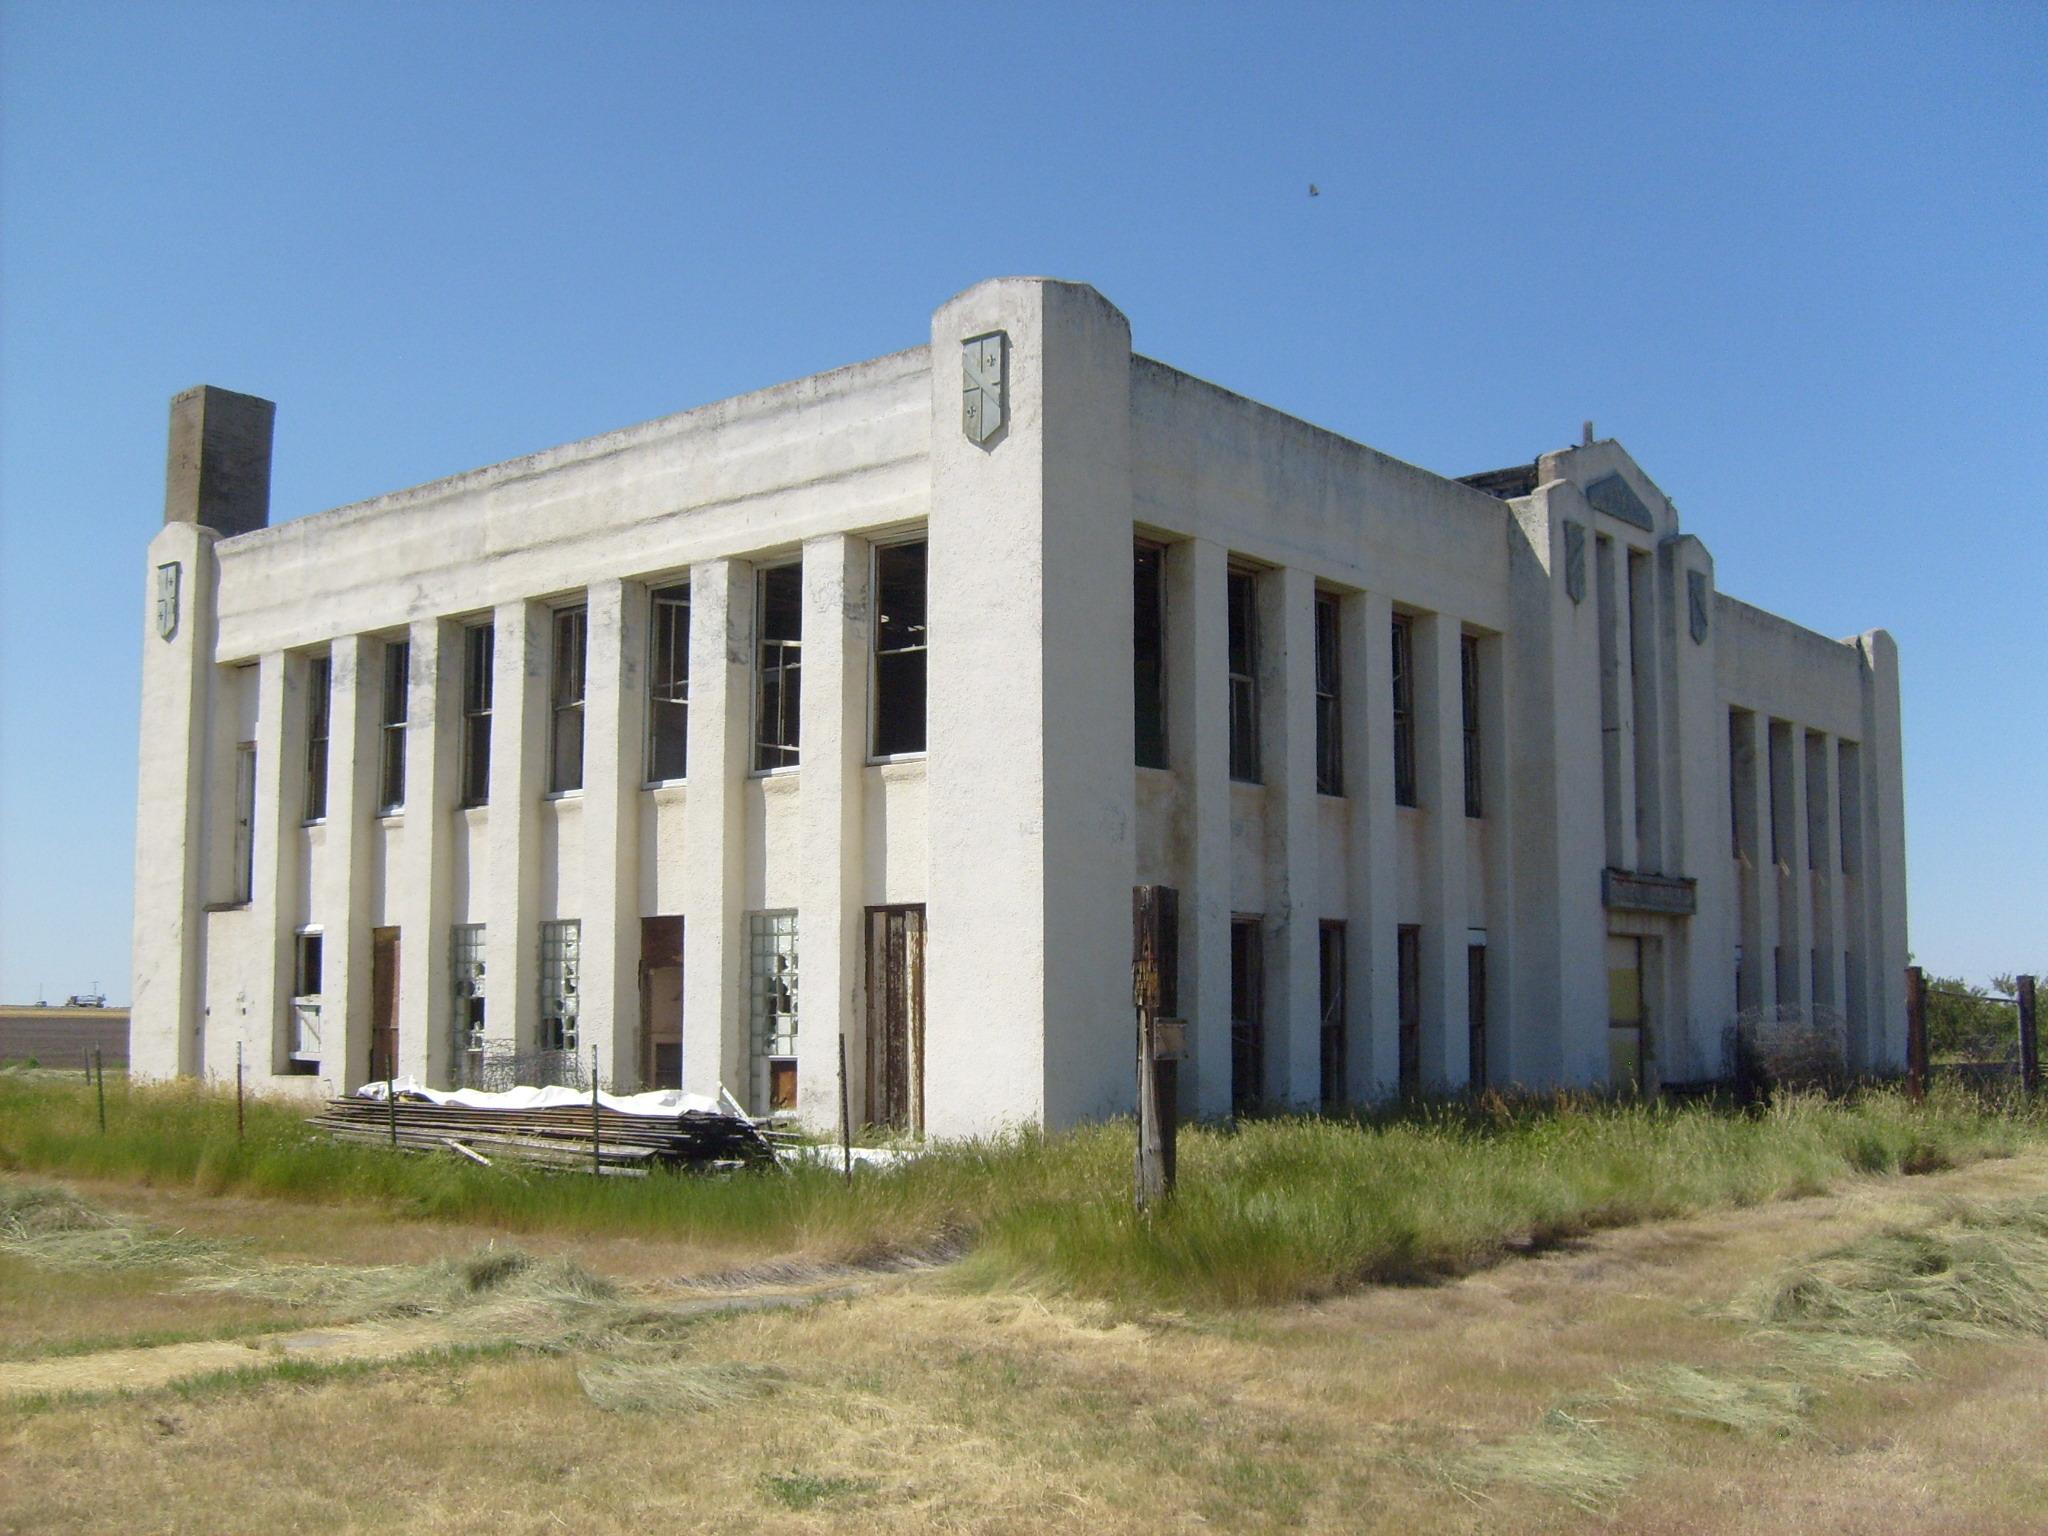 Dahl Funeral Chapel | Billings, Montana